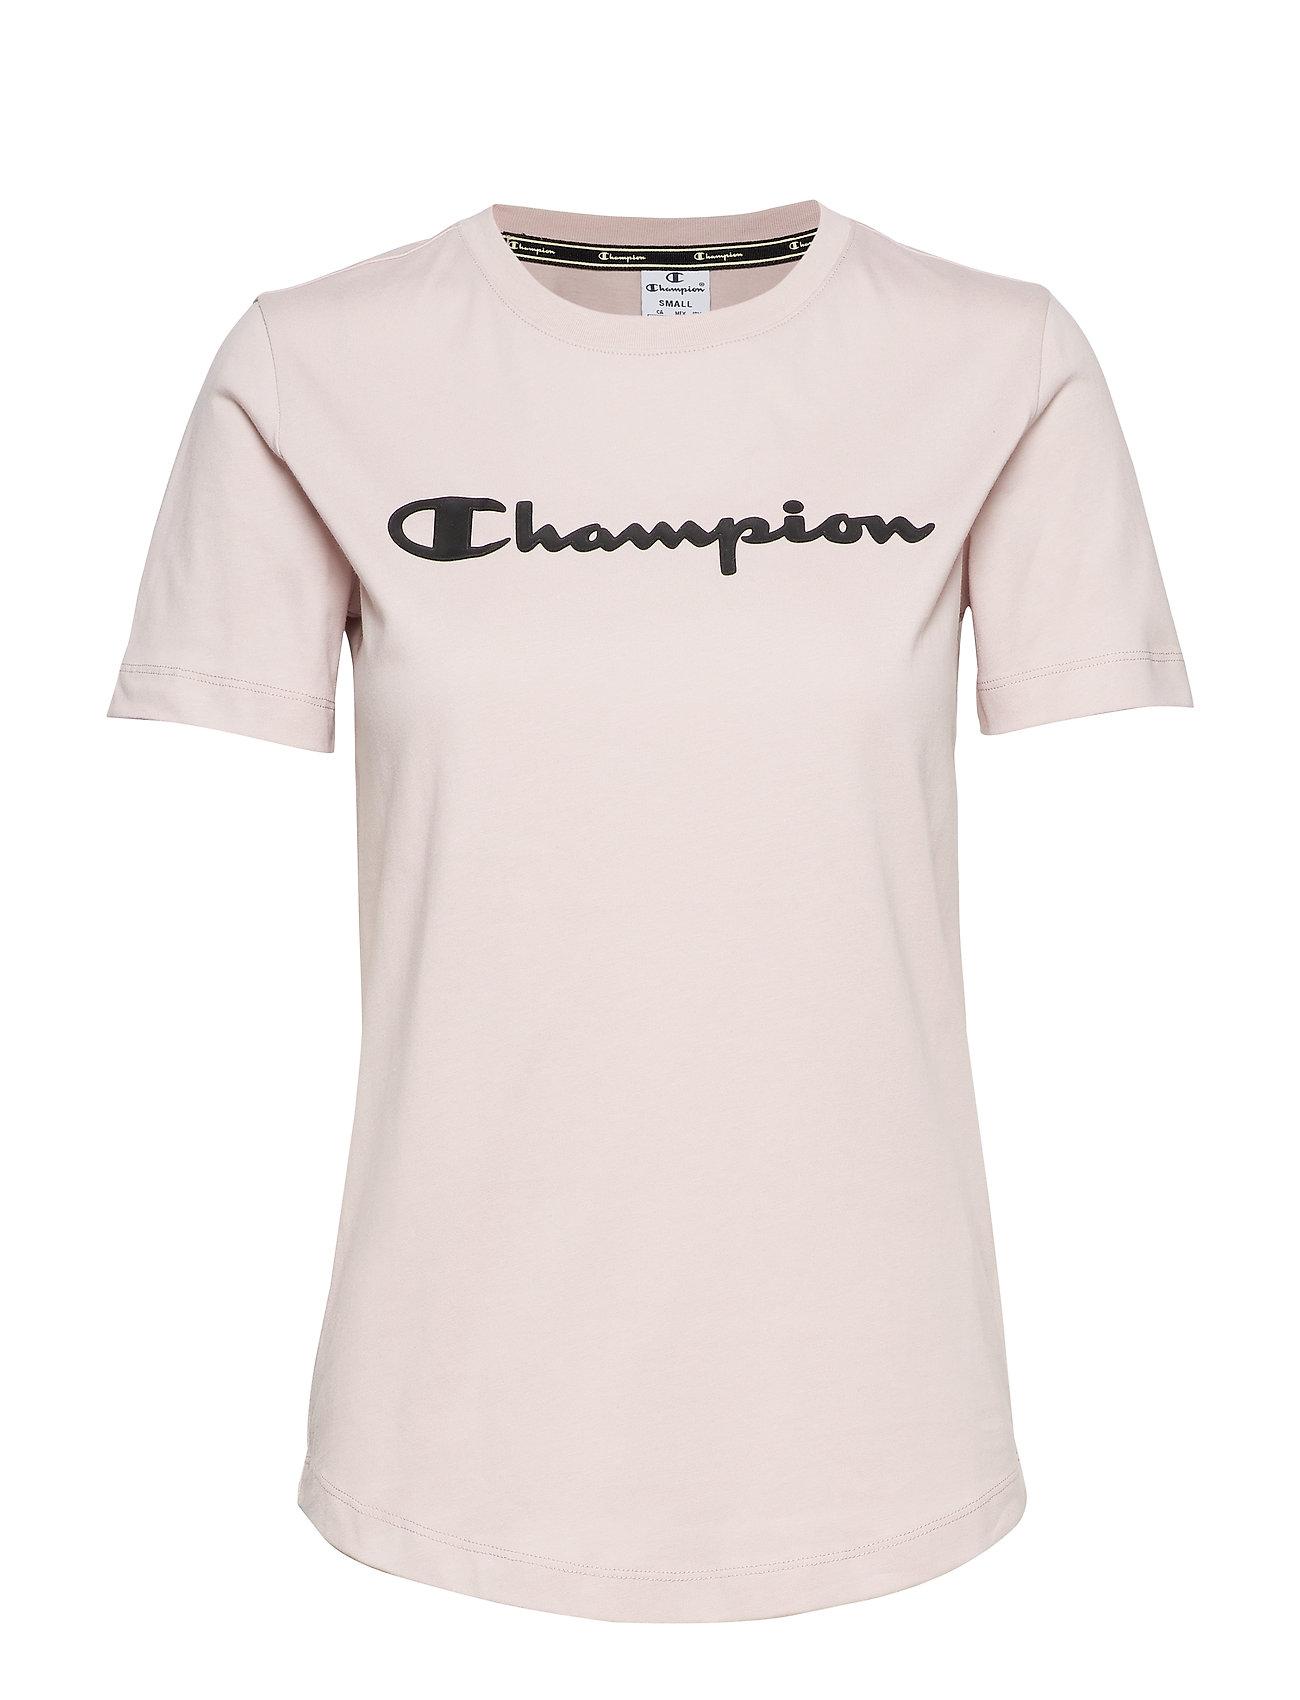 Champion Crewneck T-Shirt - VIOLET ICE